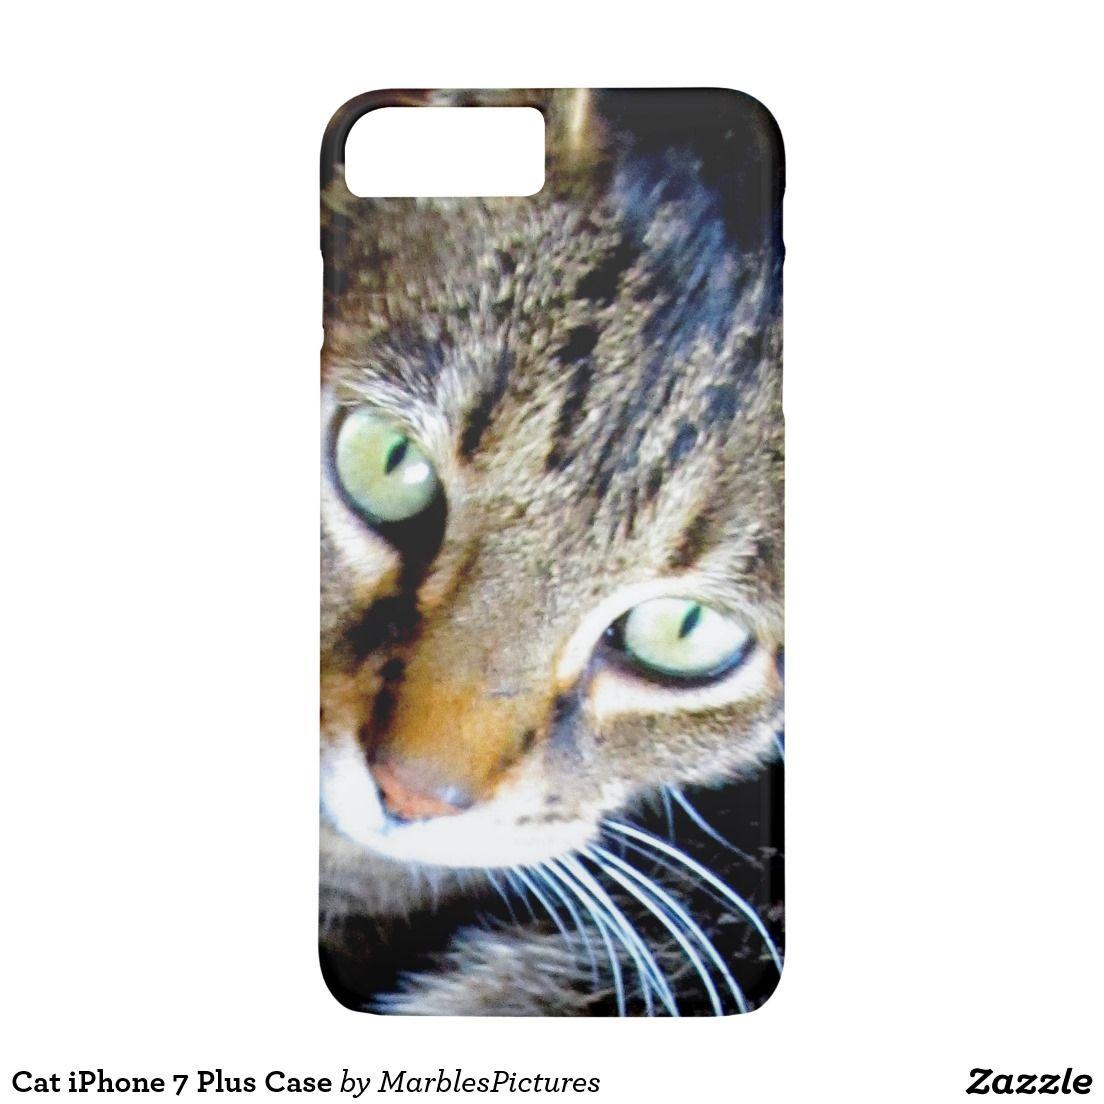 Cat iphone 7 plus case iphone case covers cats iphone